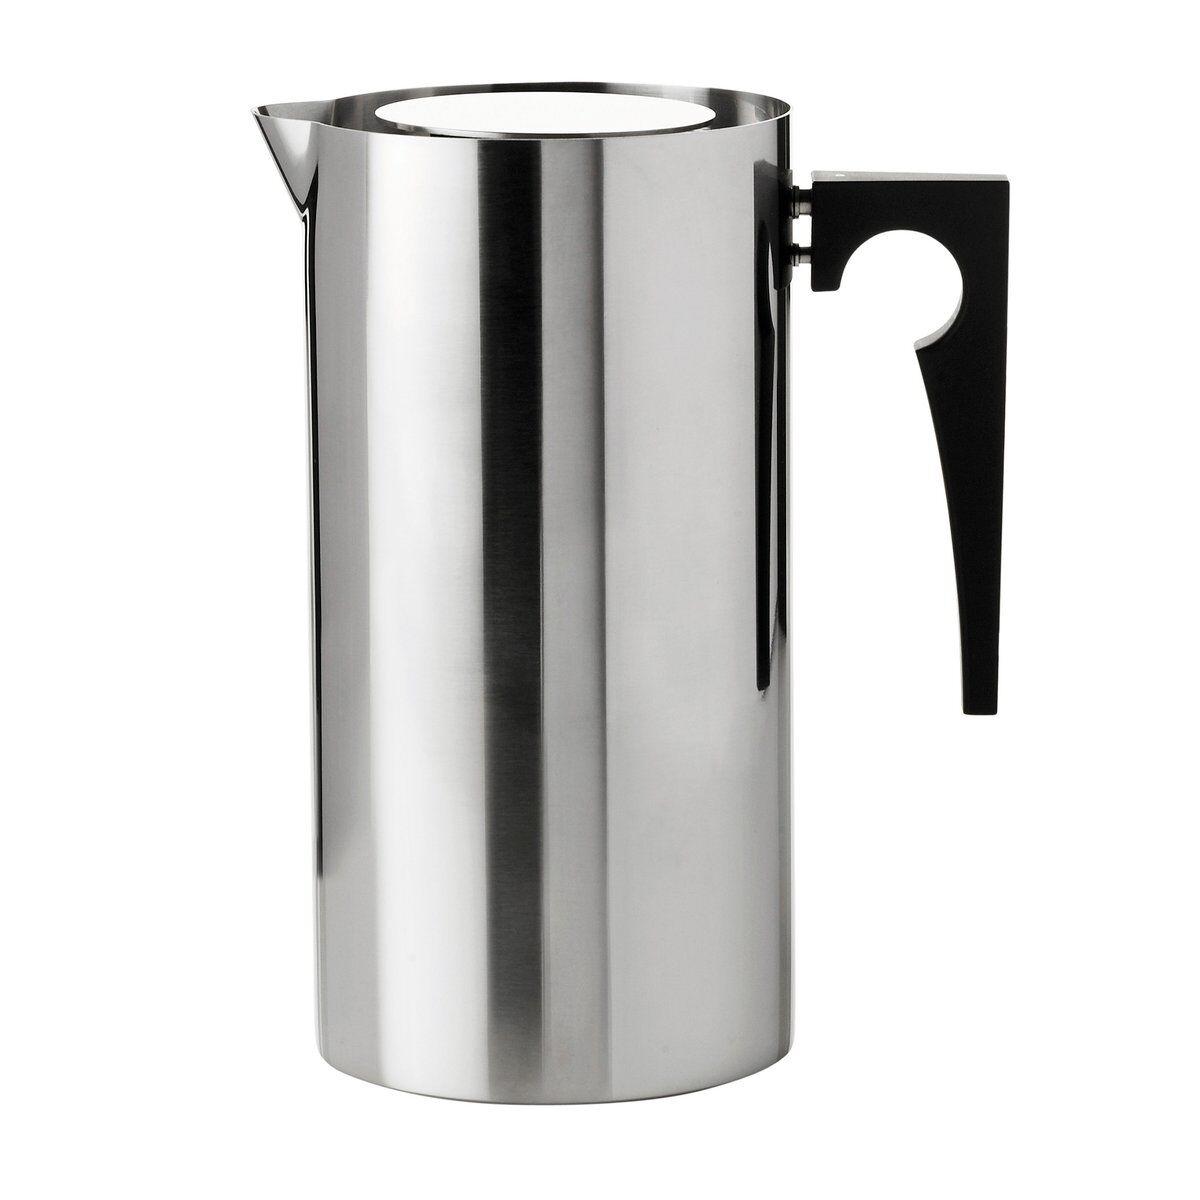 Stelton AJ cylinda-line presskanne kaffe 1 l Rustfri